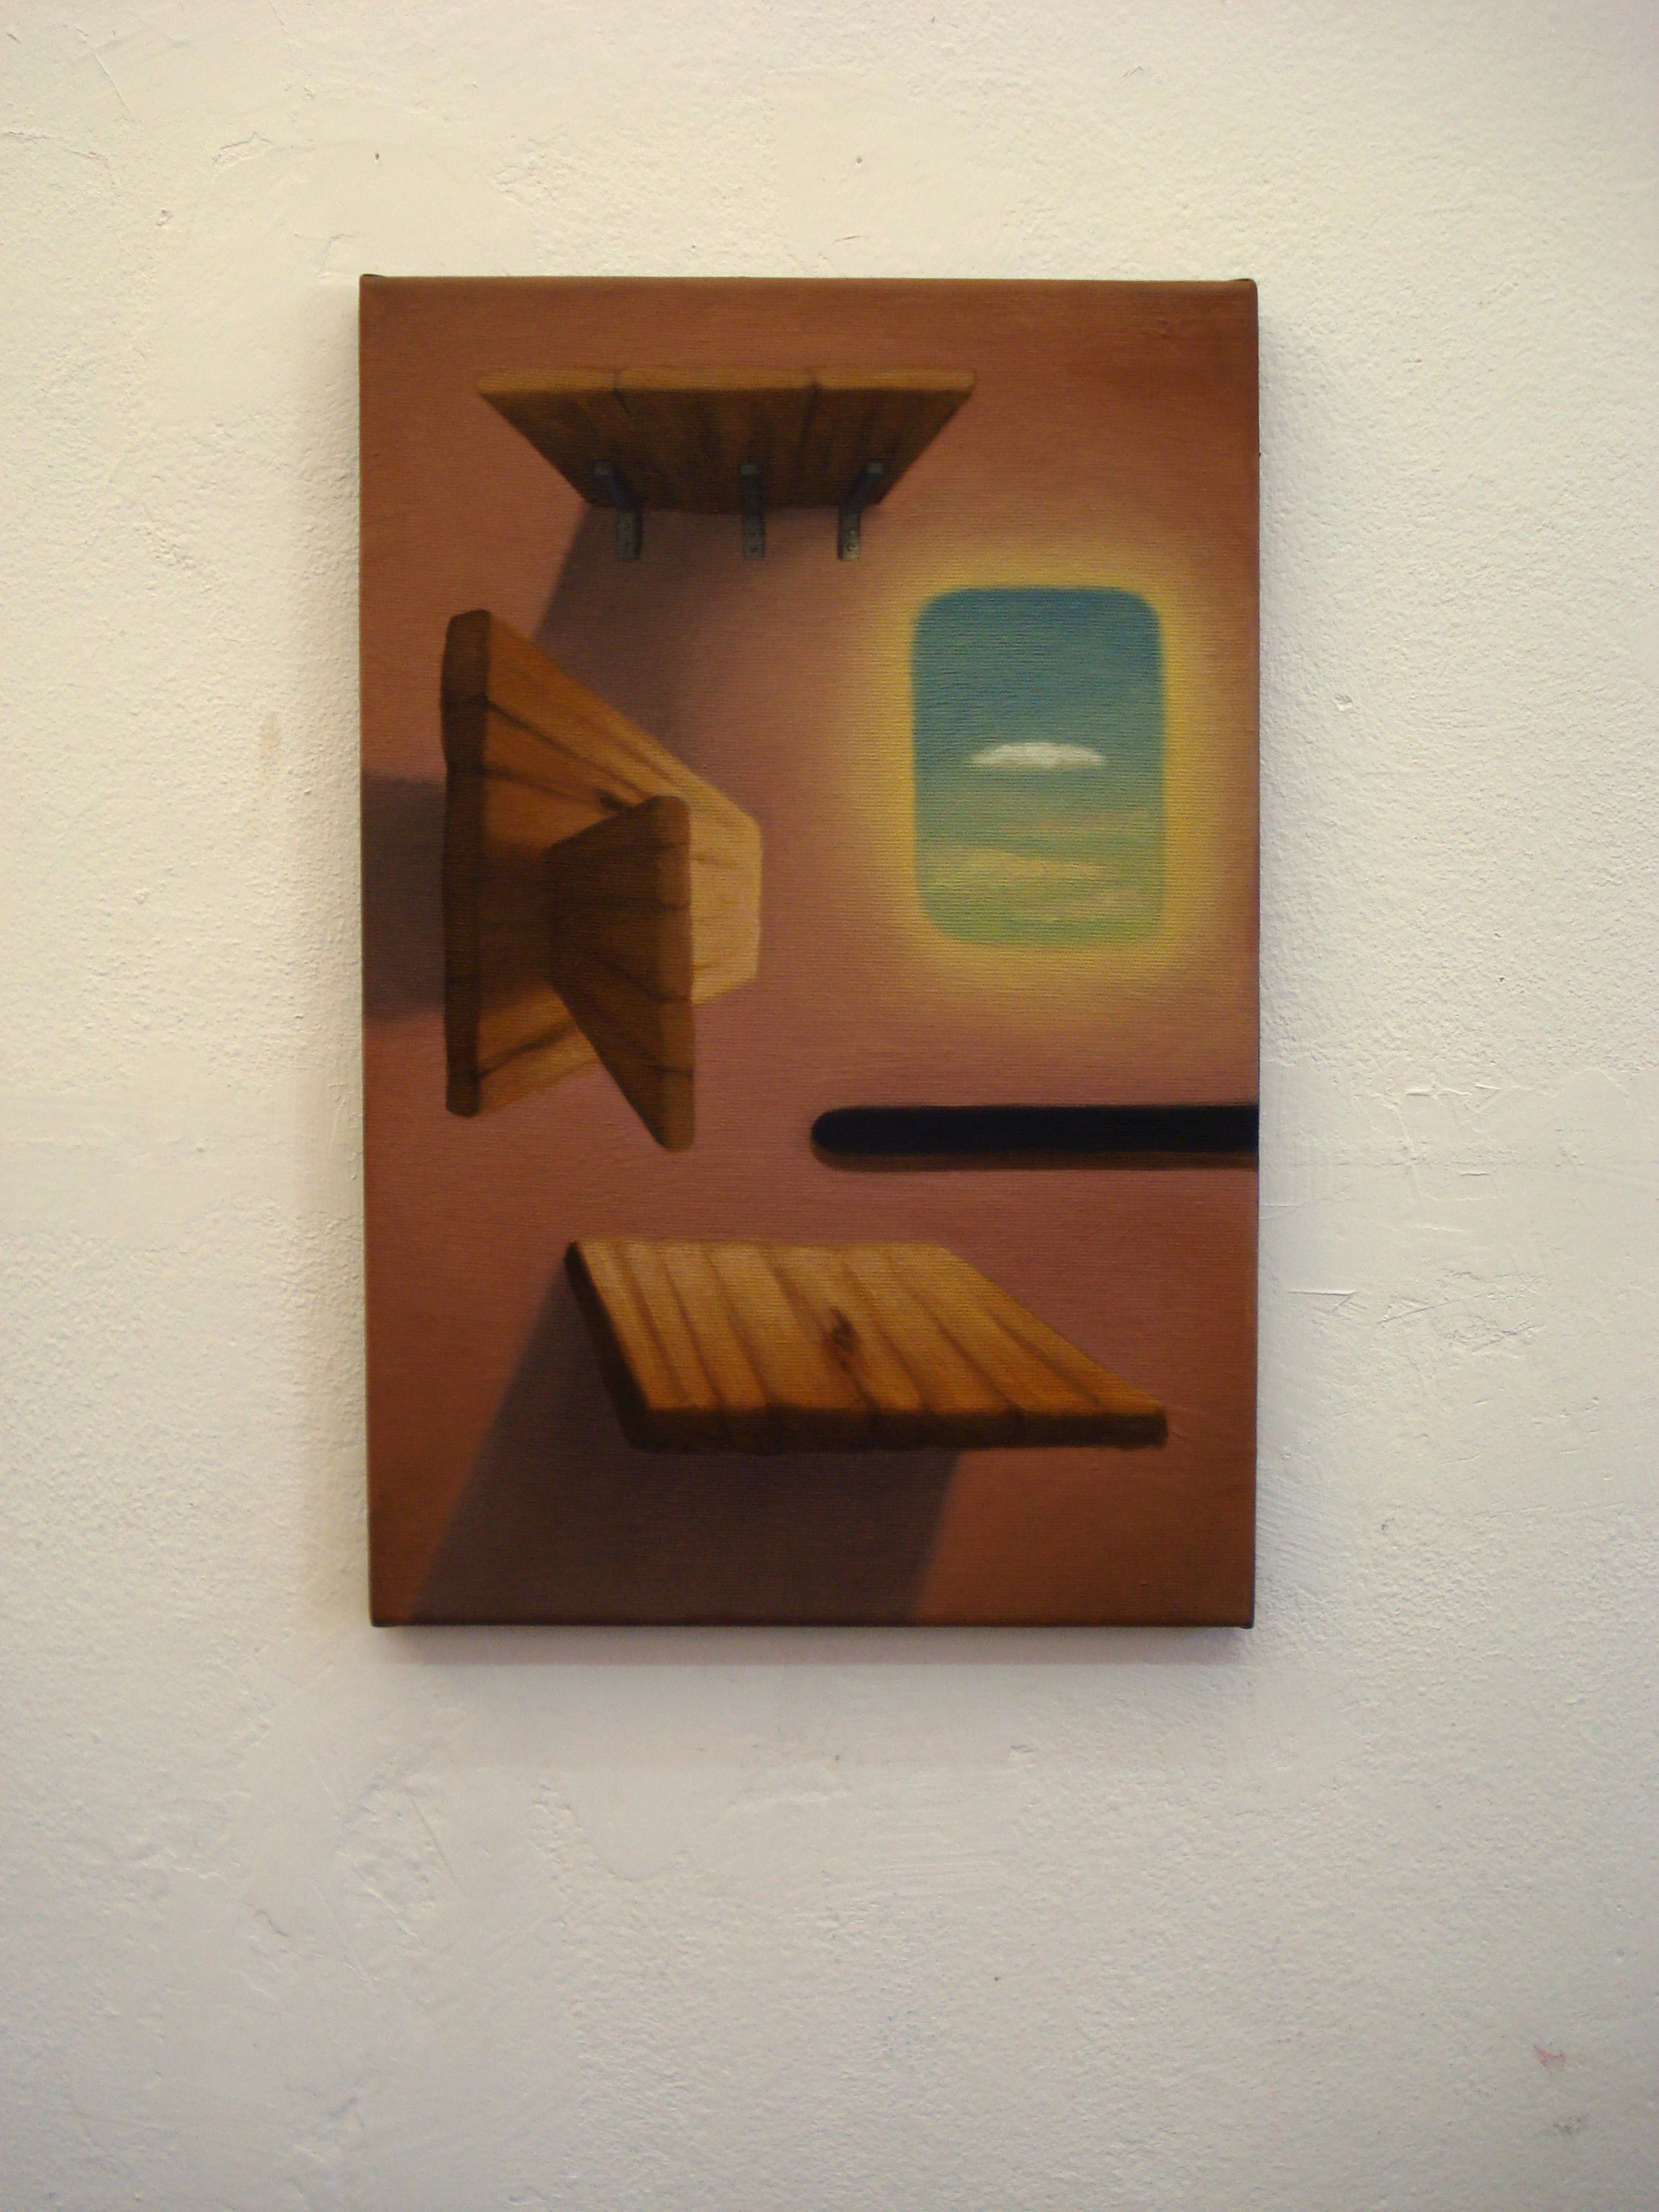 Juan Reos - Estantes y ventana - Óleo sobre tela -50x30 aprox - 2013